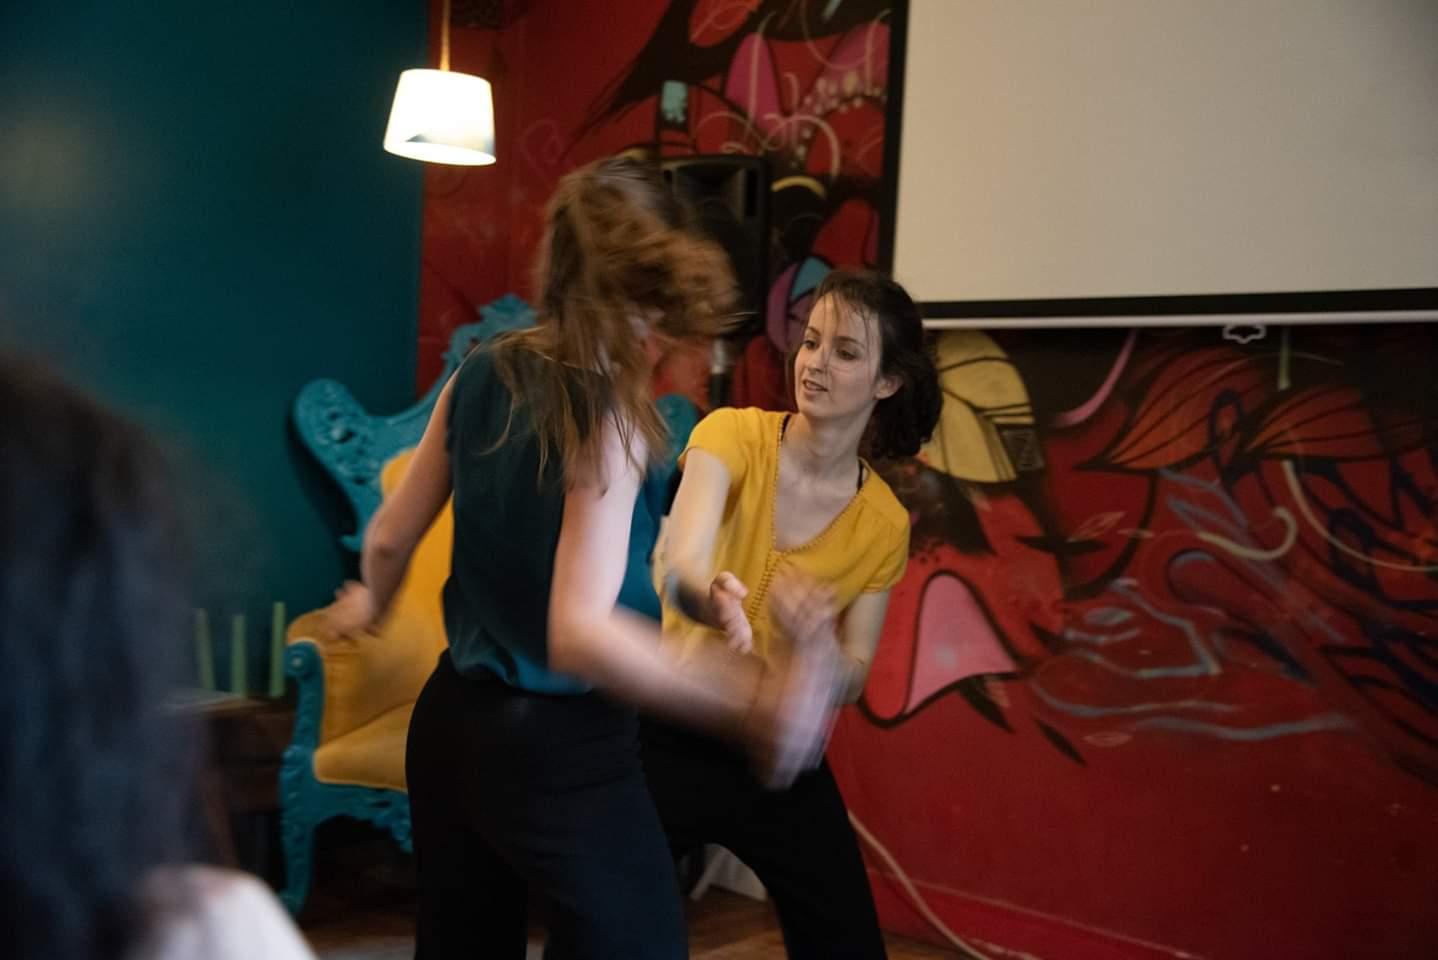 danse improvisé